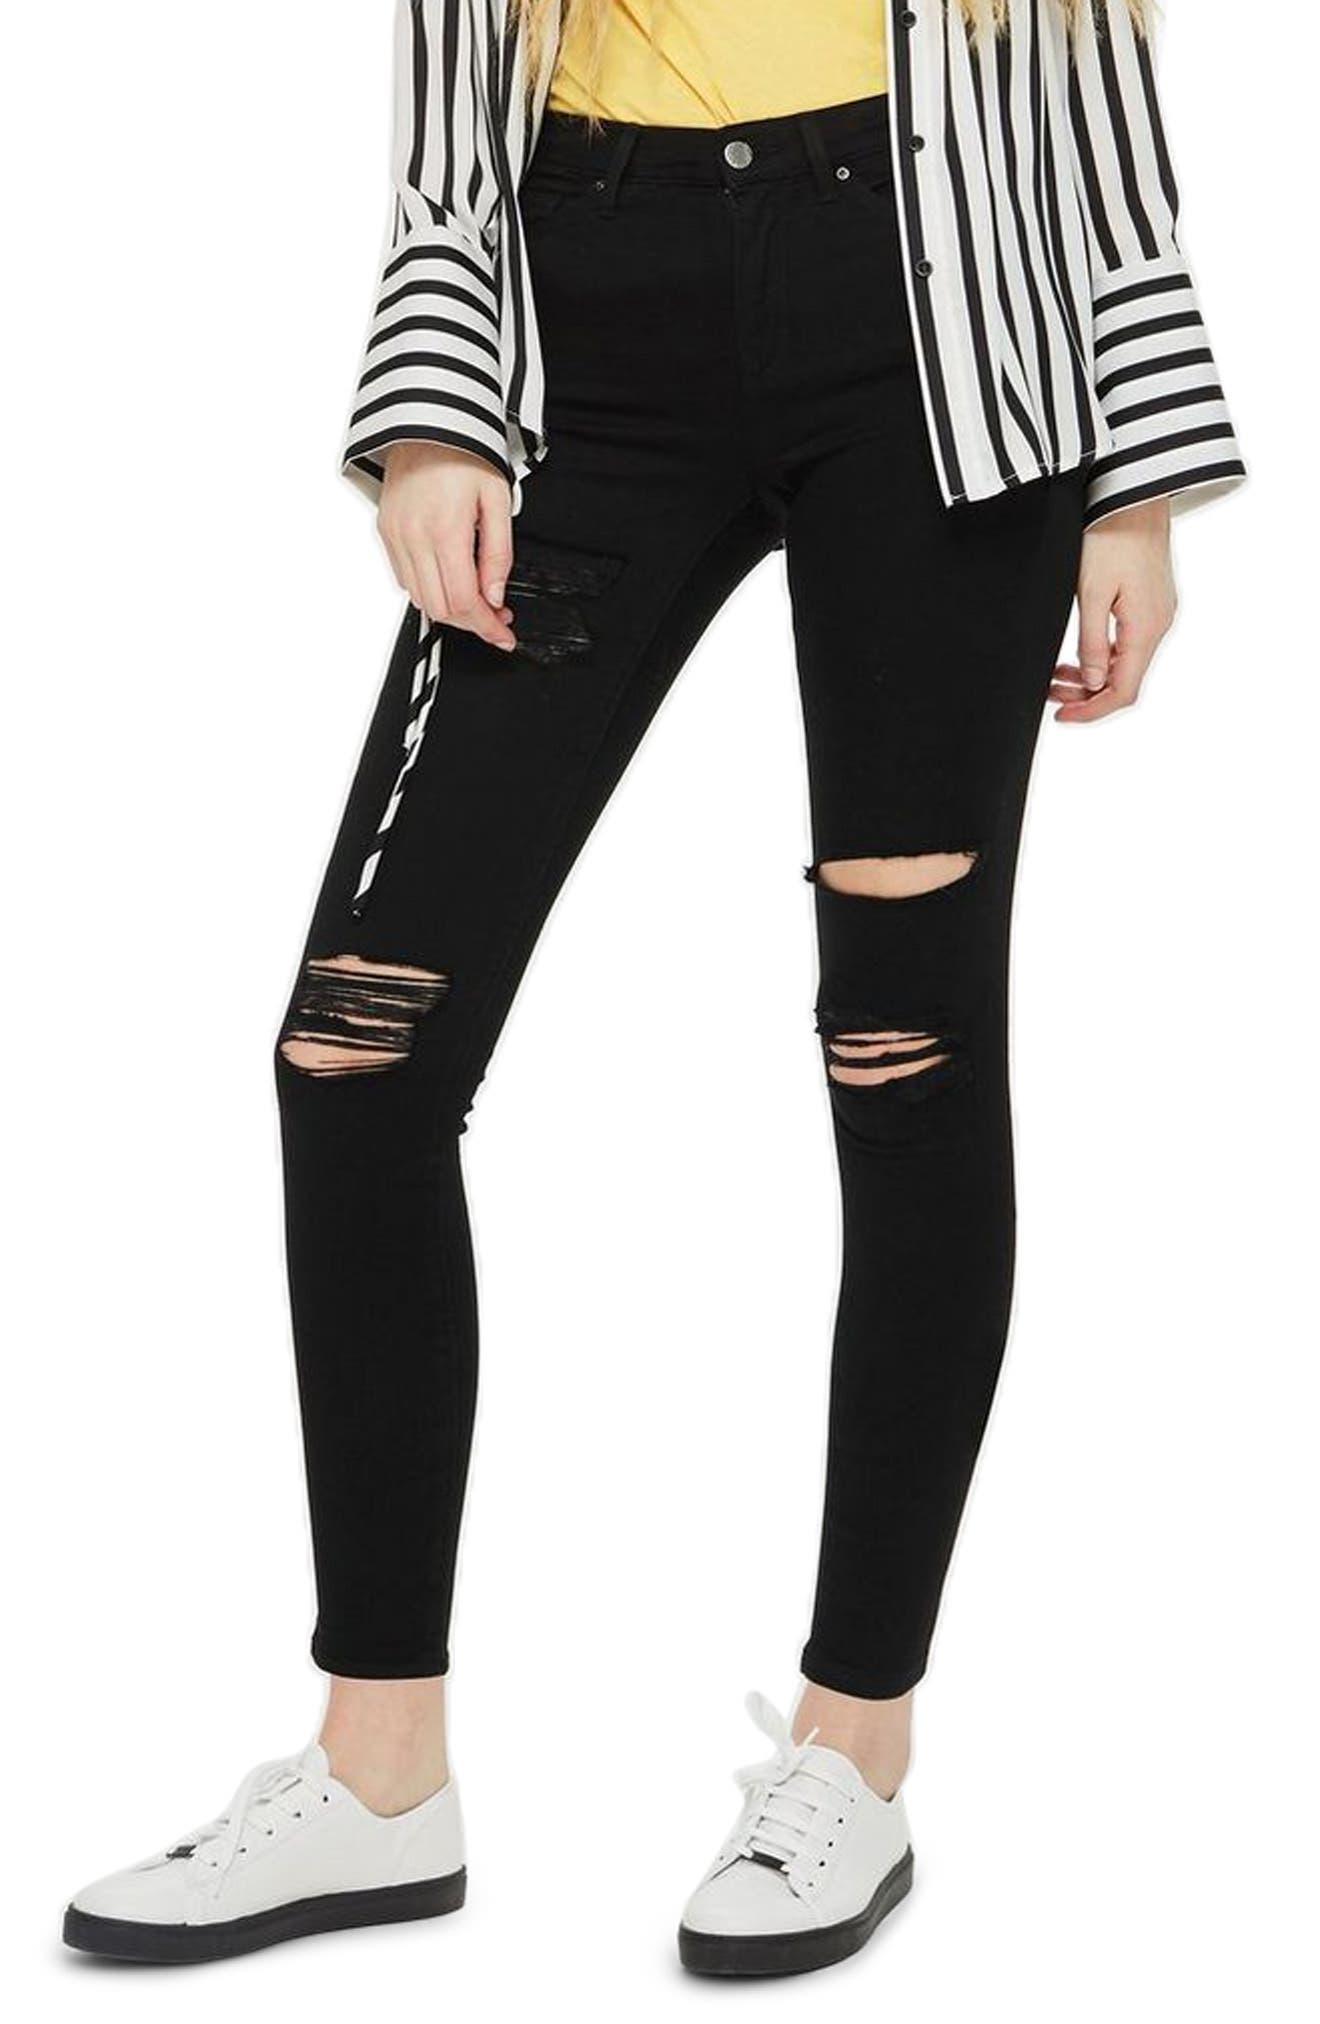 MOTO Leigh Super Rip Jeans,                         Main,                         color, Black